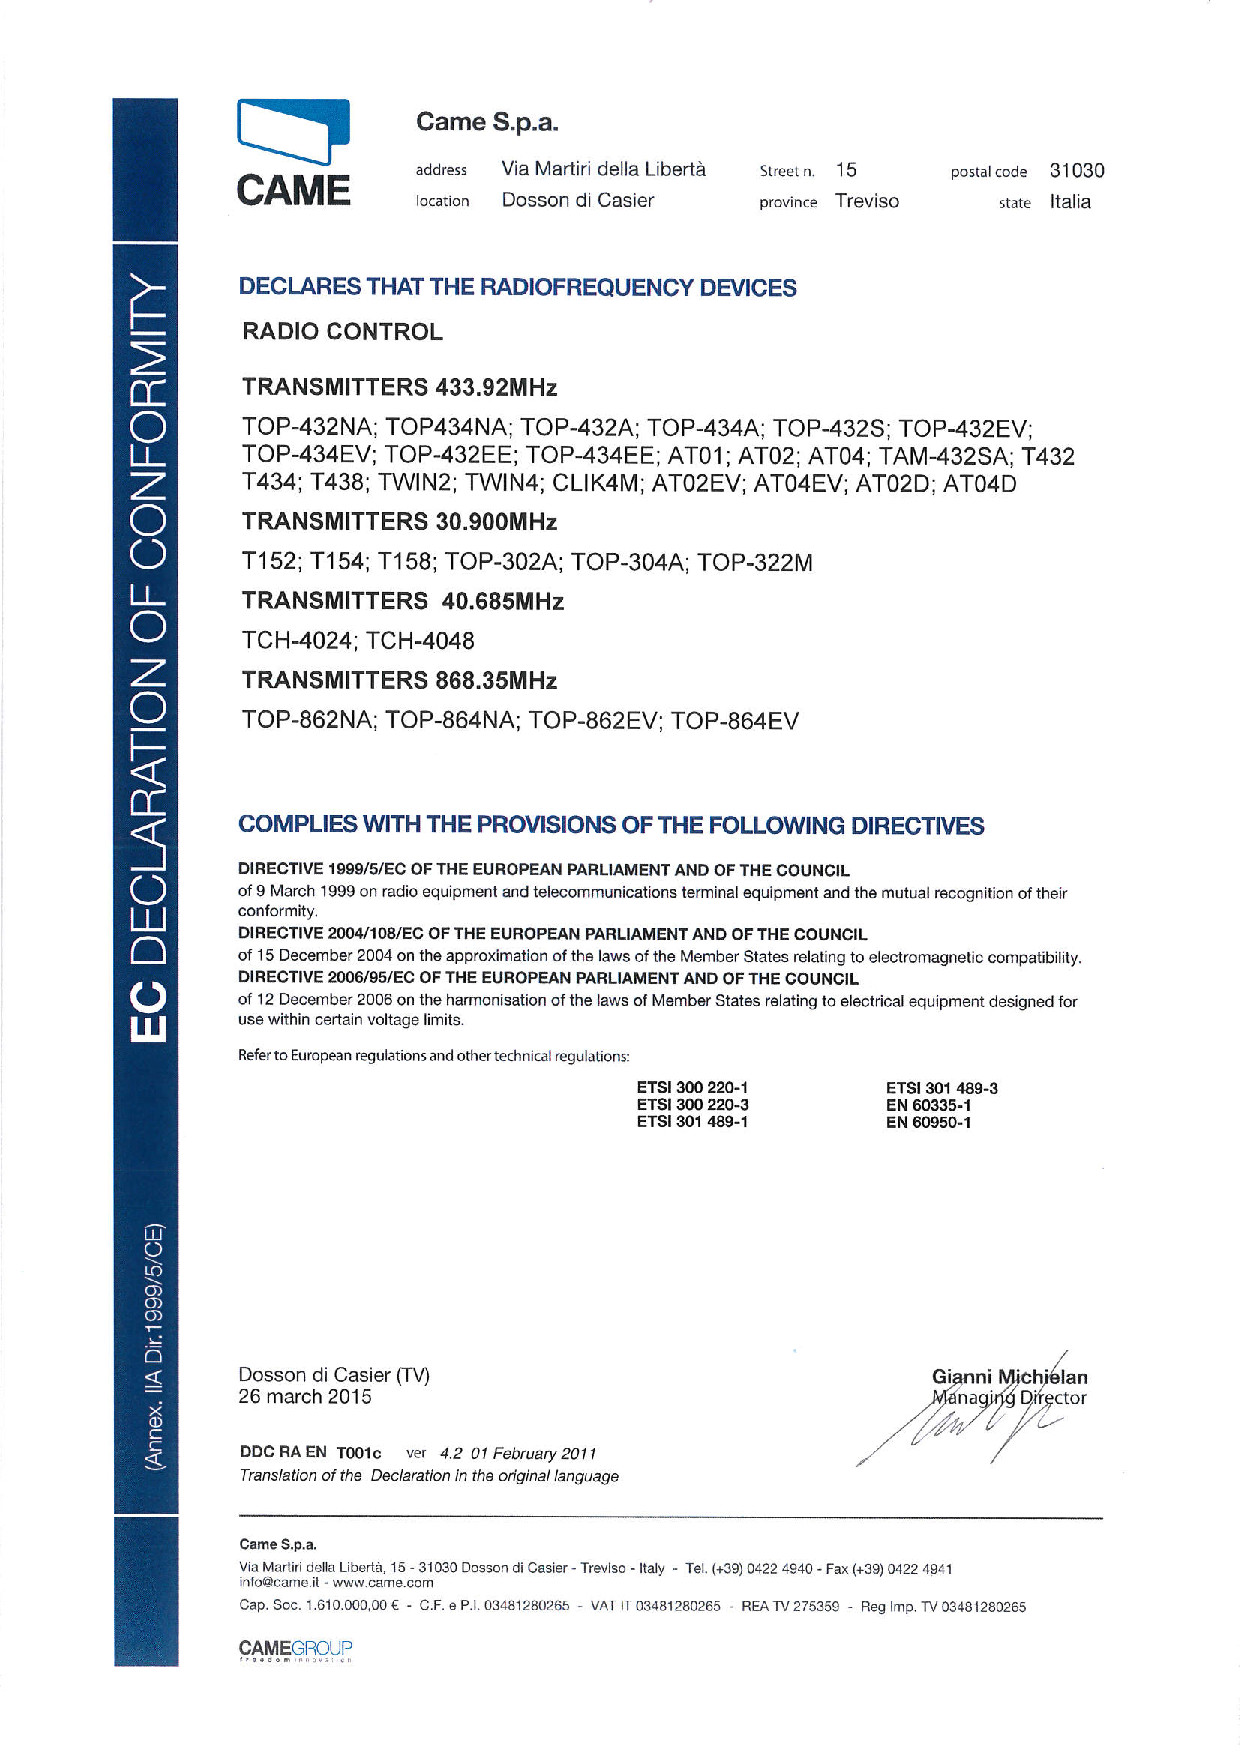 Certifikát CAME